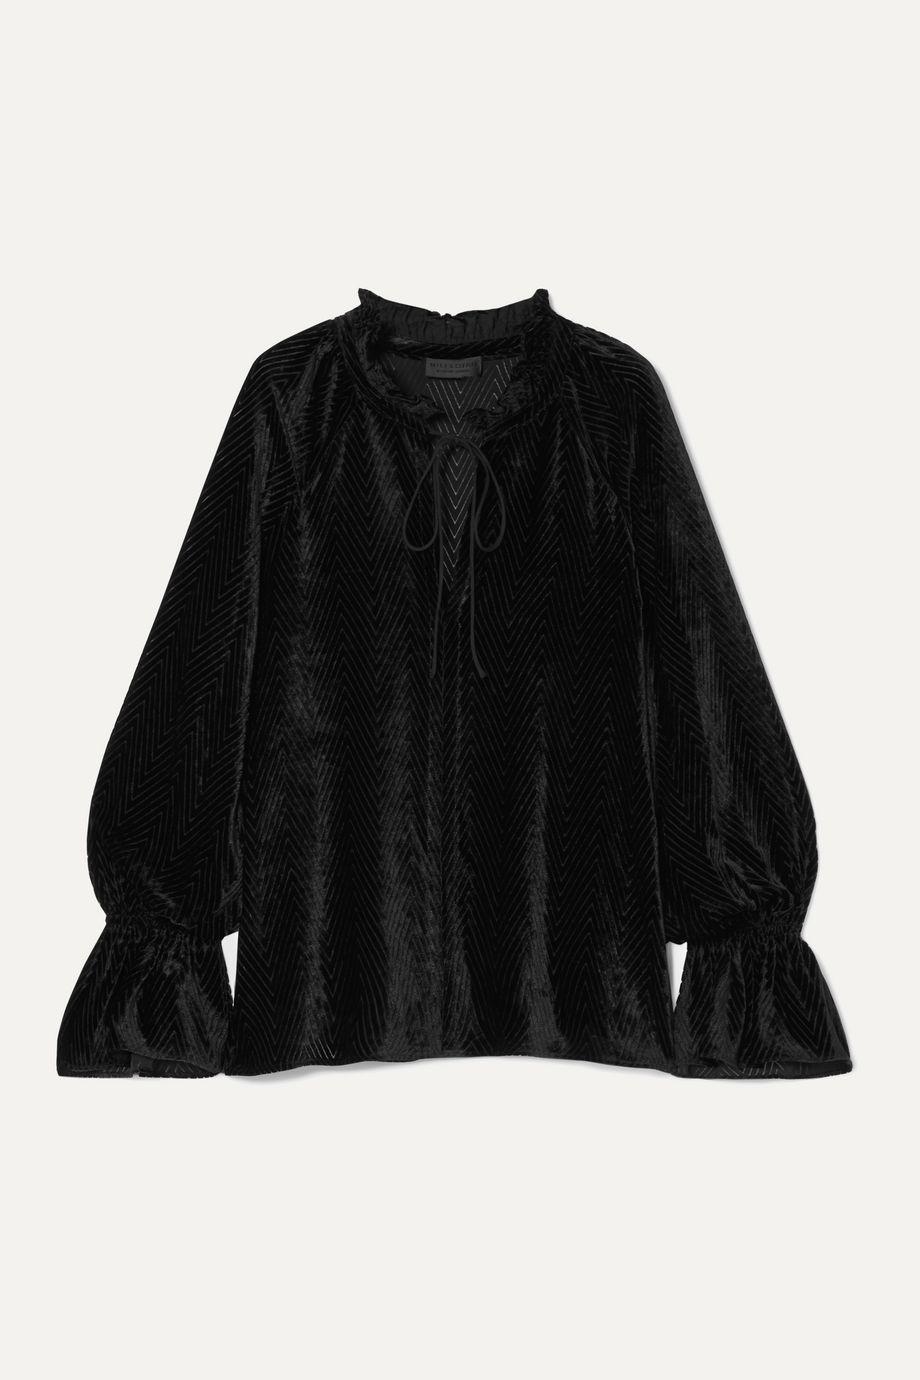 Nili Lotan Royan tie-detailed devoré-velvet blouse